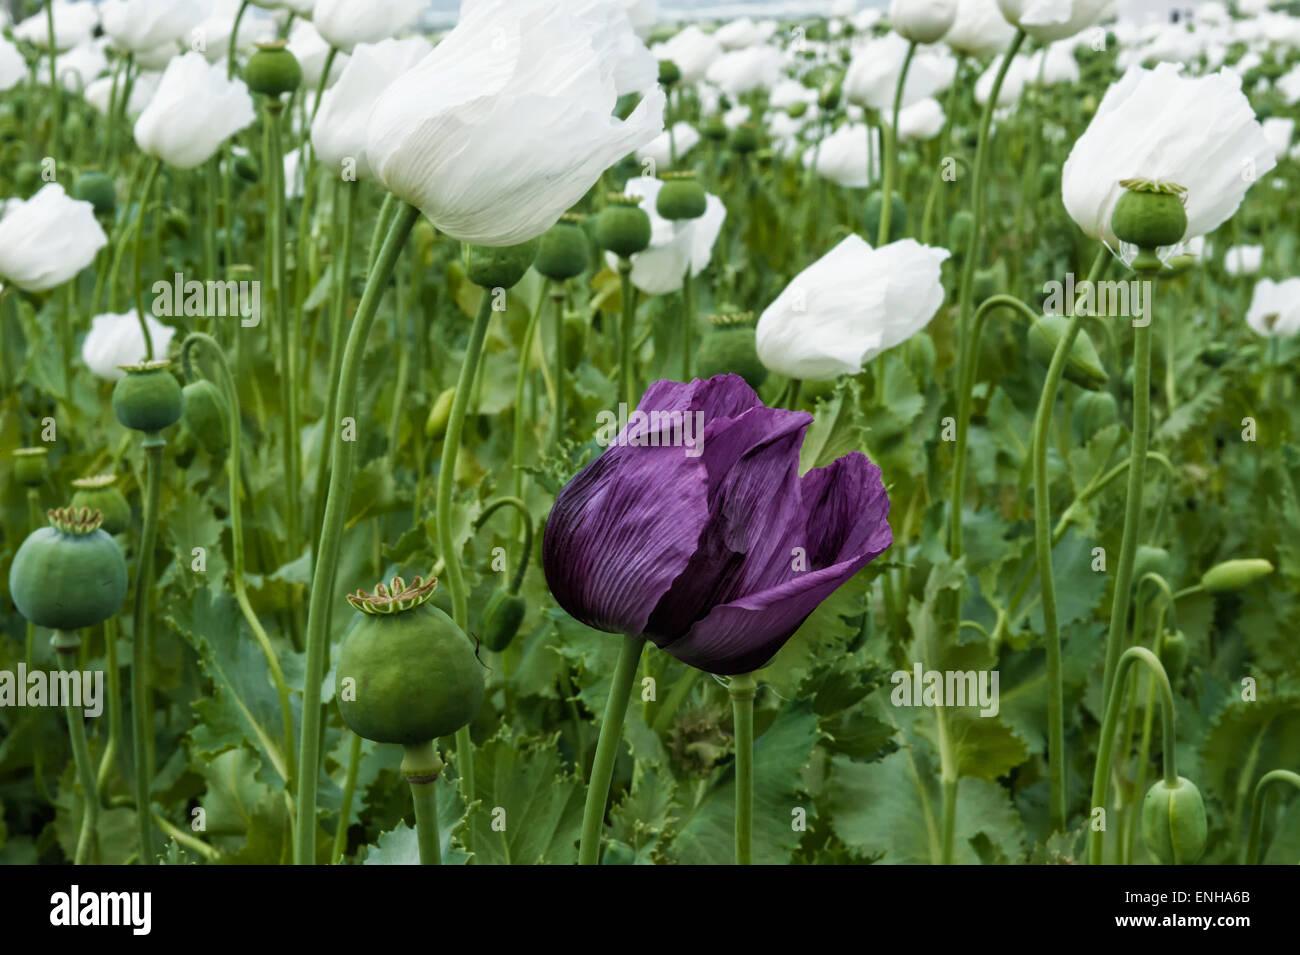 Opium poppy field papaver somniferum turkey stock photo opium poppy field papaver somniferum turkey mightylinksfo